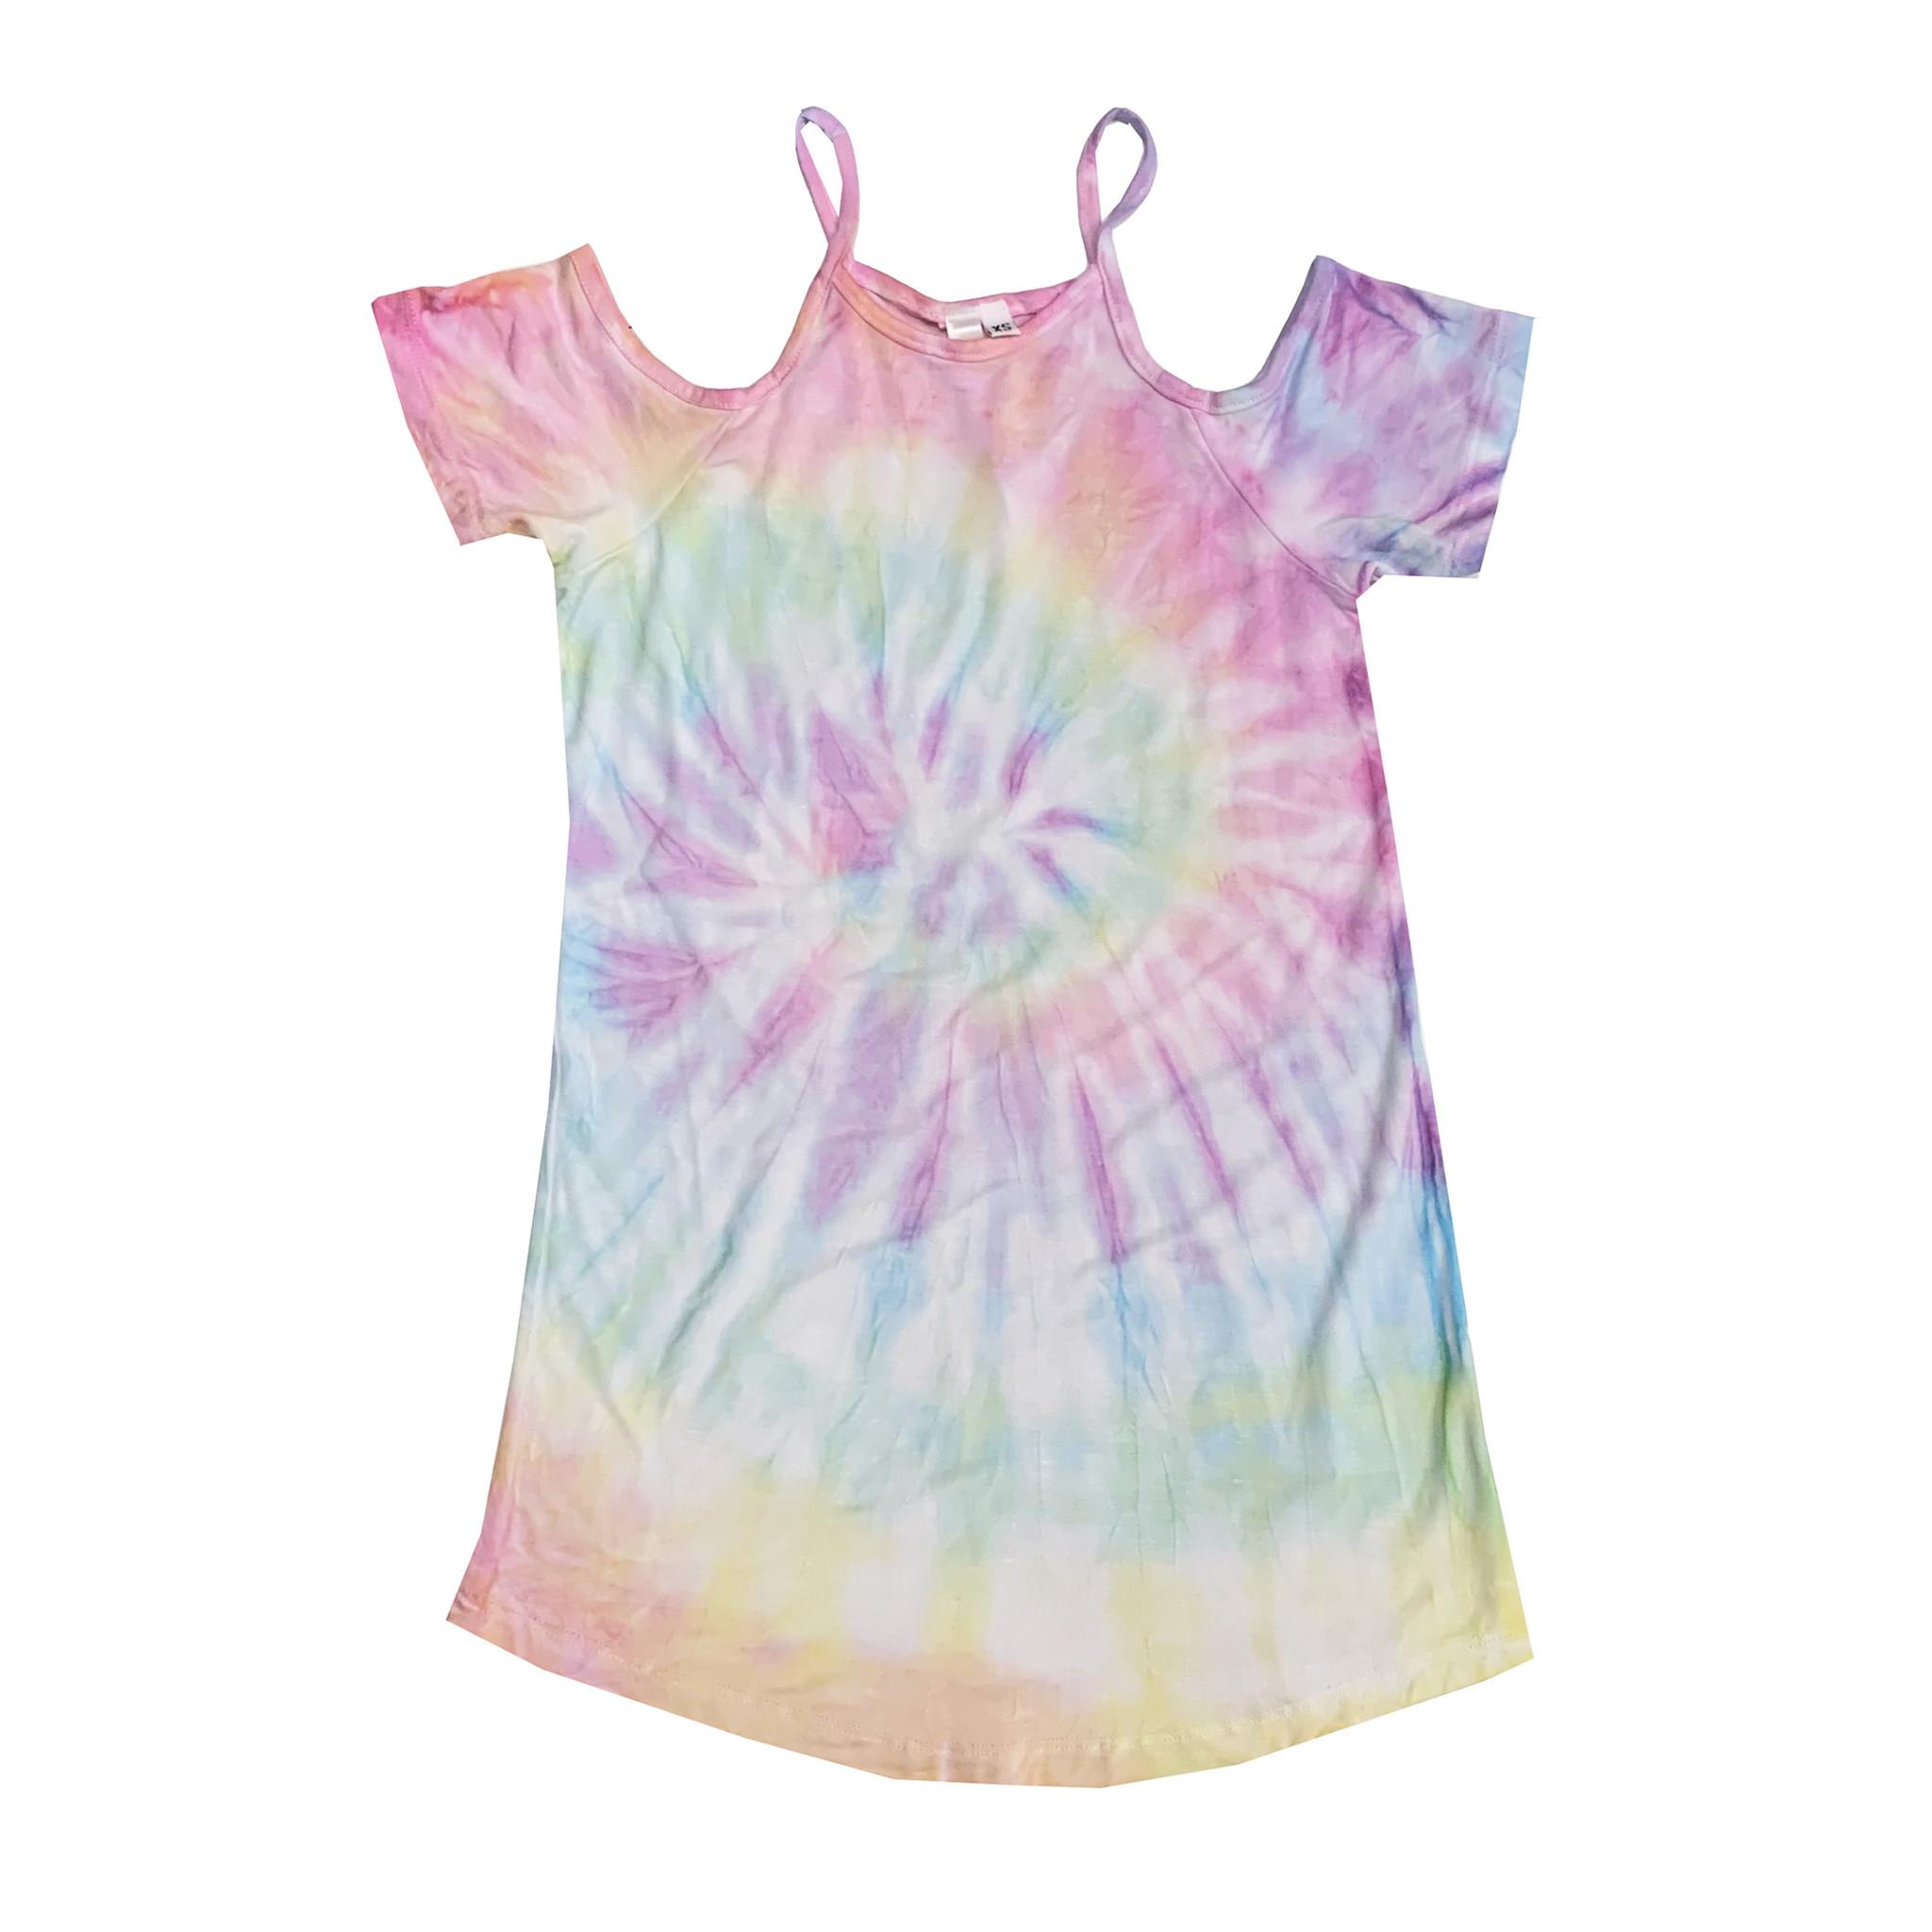 Malibu Sugar Tie Dye Cold Shoulder Dress